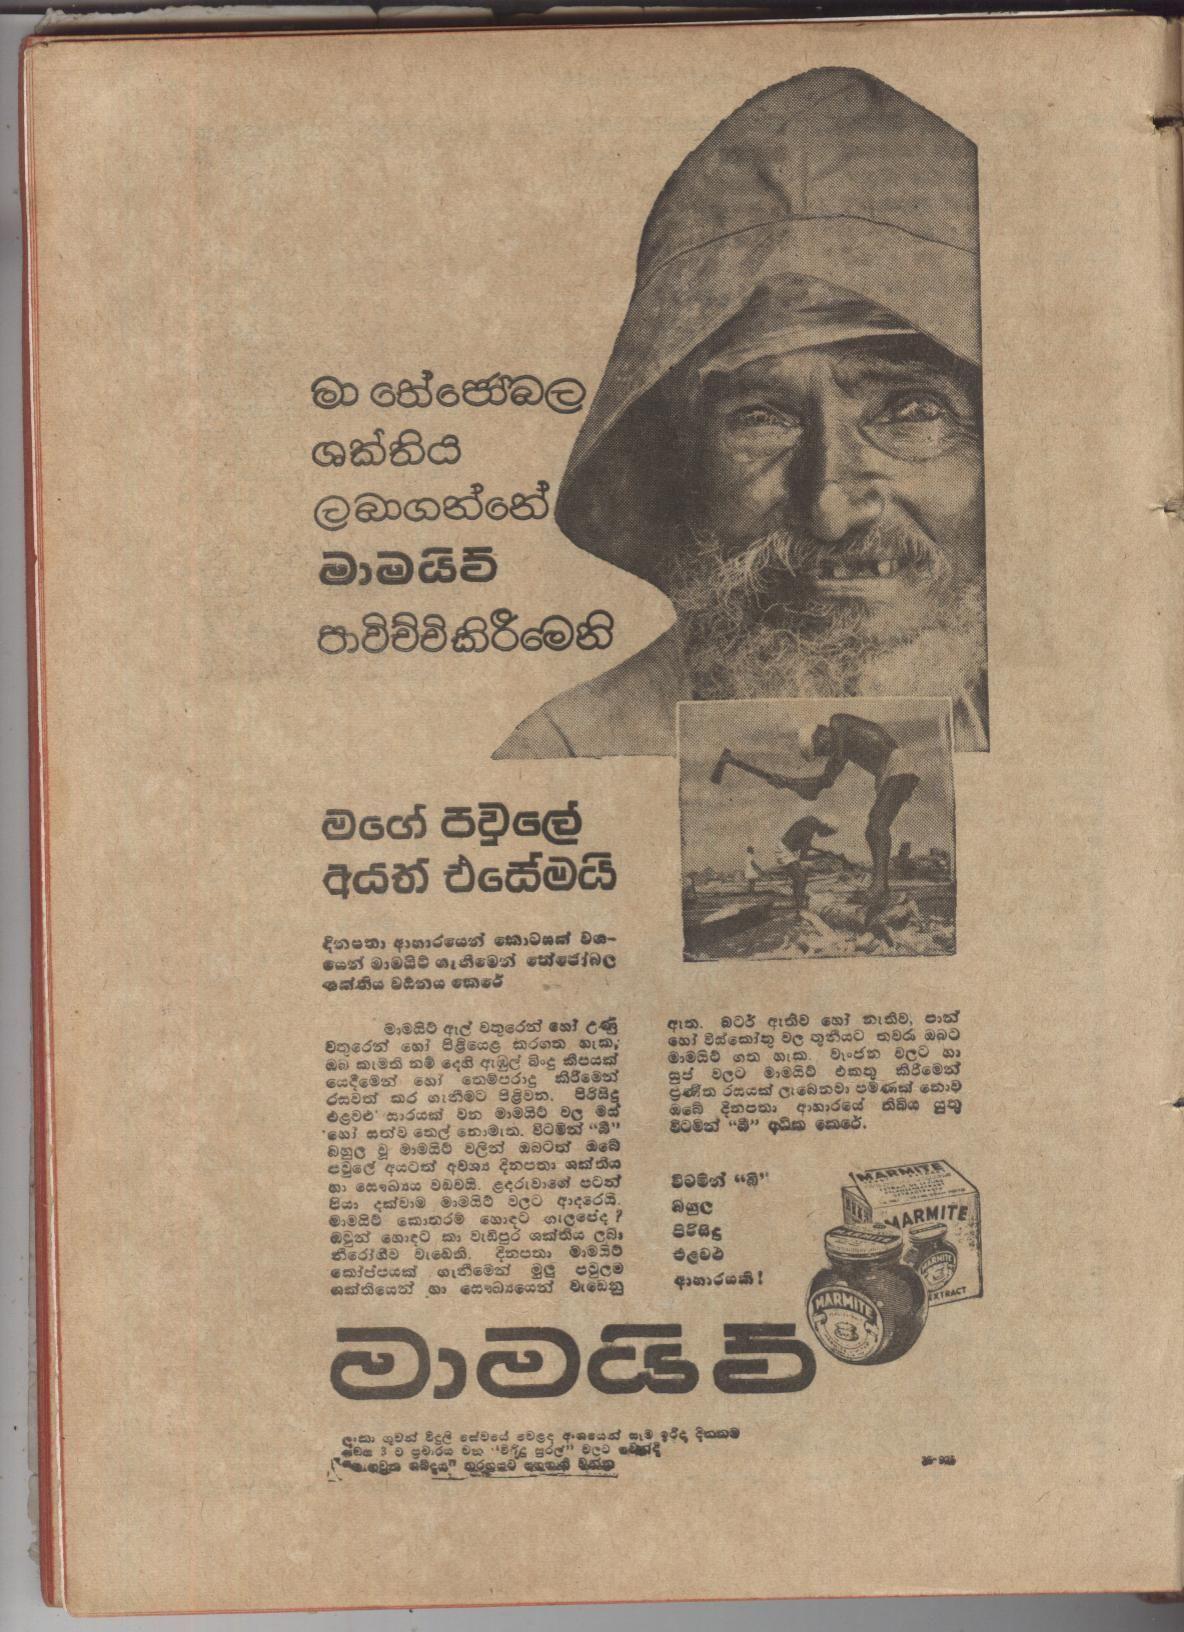 Marmite Srilankaoldpaperadvertisement Old Paper Vintage Advertisements Sri Lanka